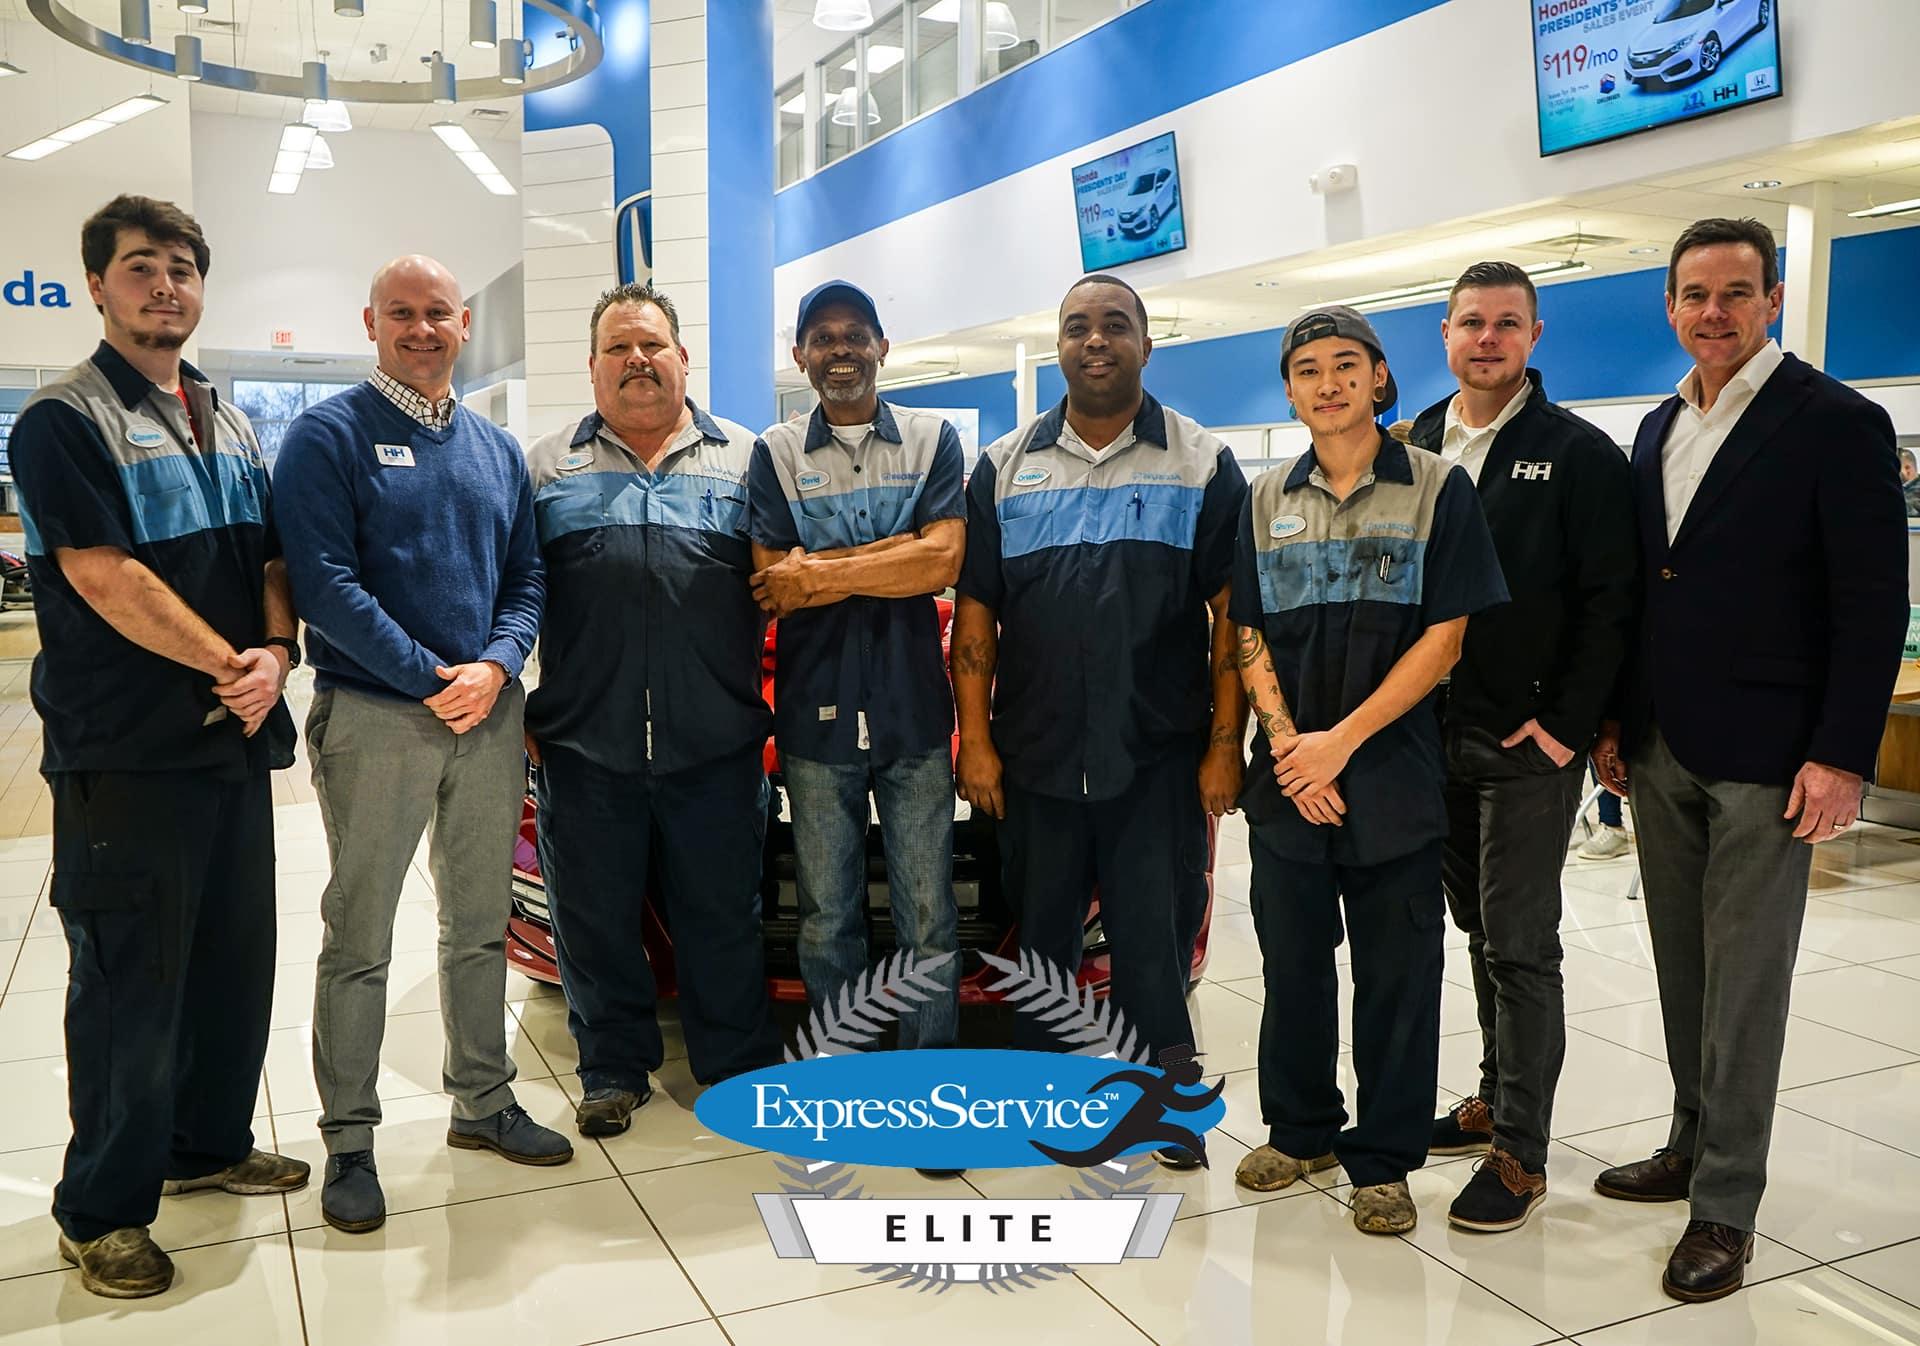 Express Service Elite Award, Holmes Honda, Honda Service